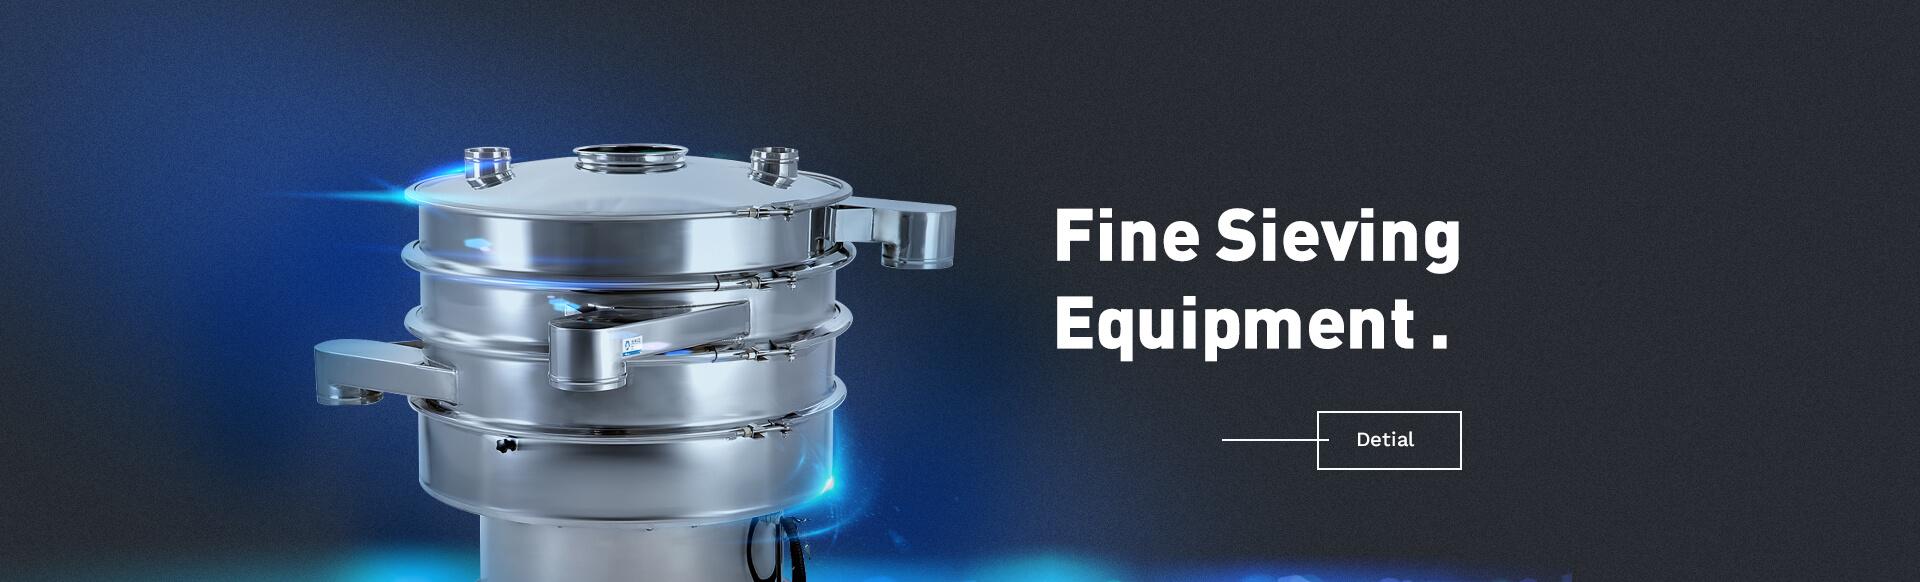 Fine sieving equipment - Gaofu Sieving